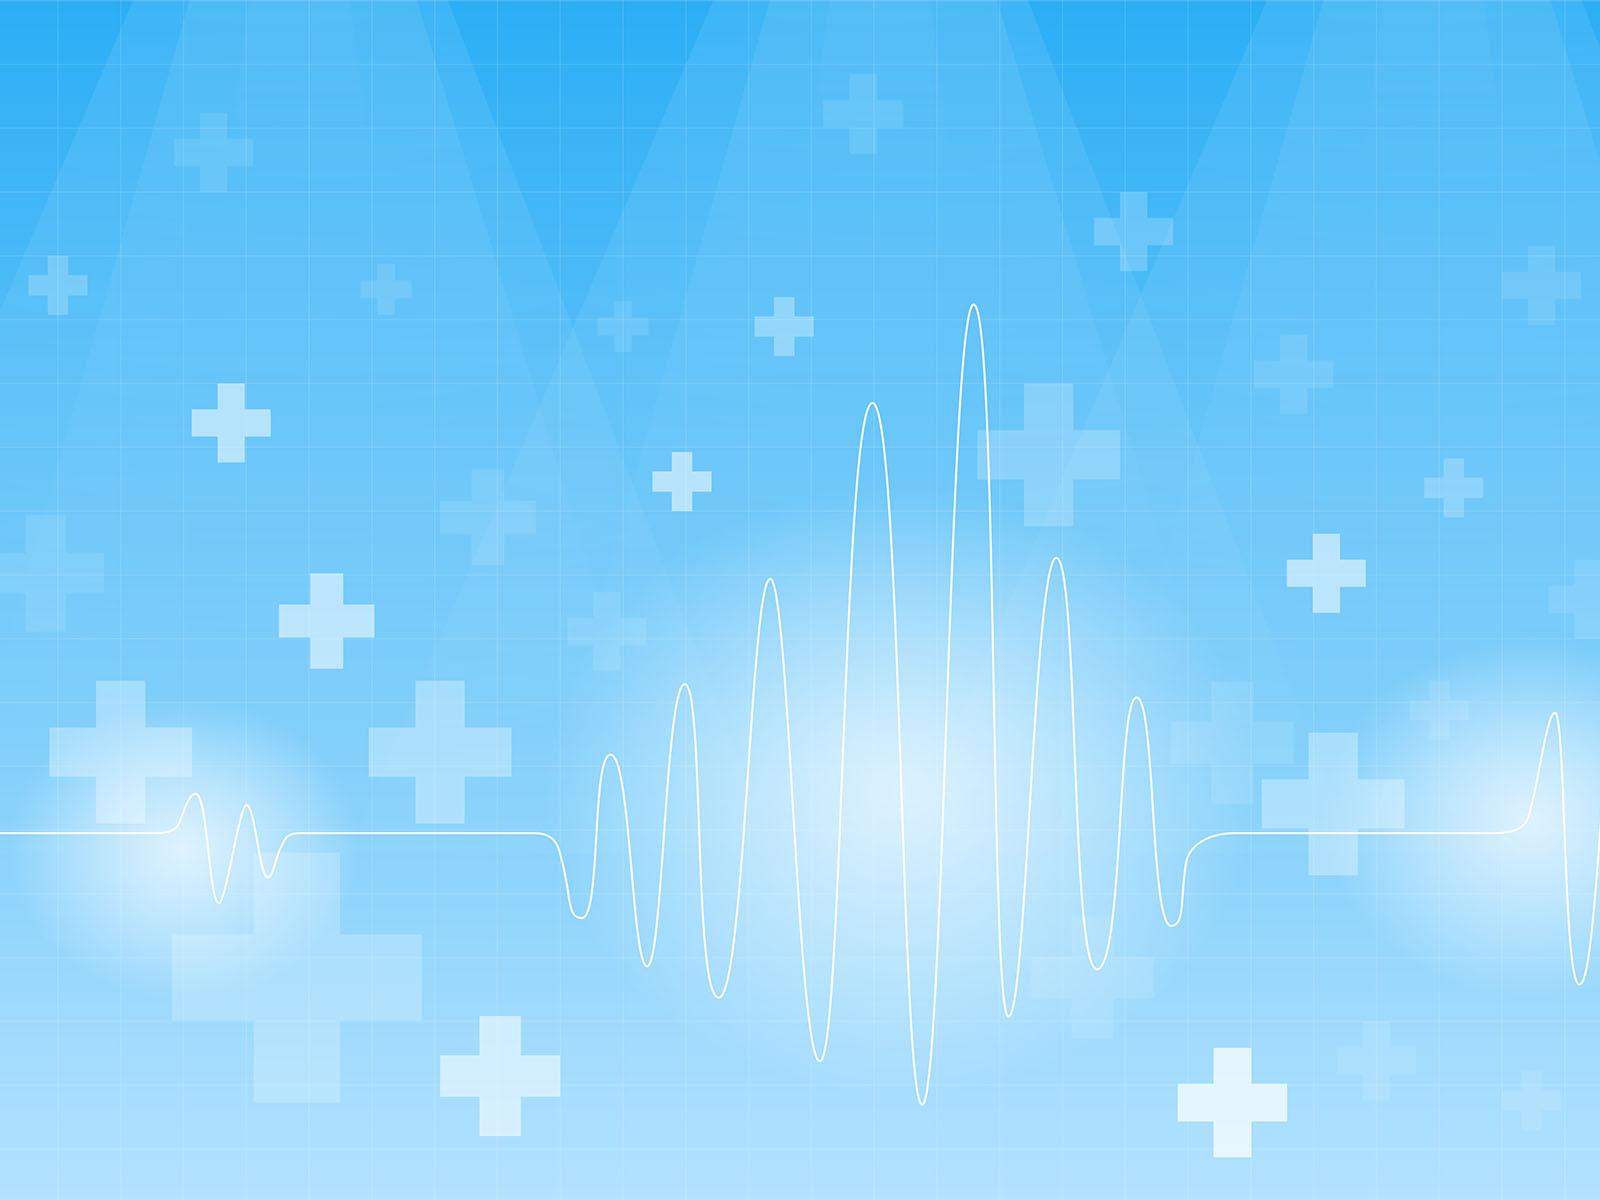 Gangster Wallpaper 3d Cardiogram On A Blue Backgrounds Blue Health Medical